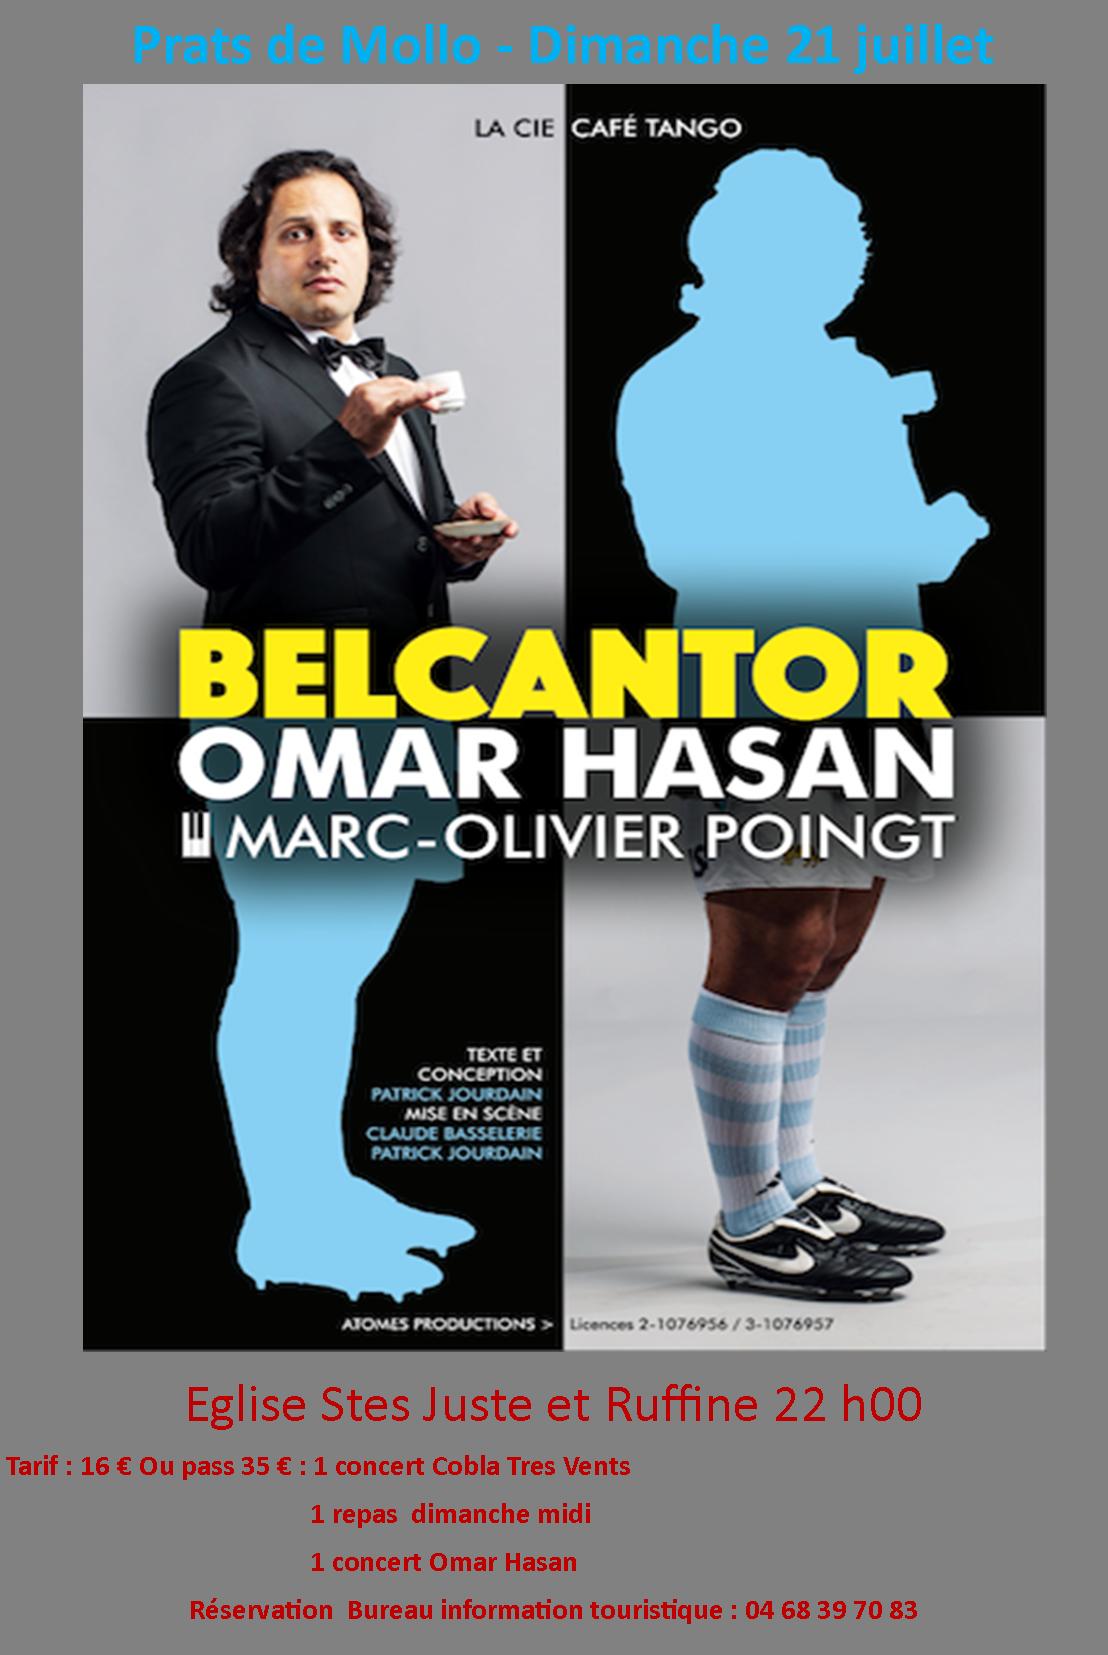 BELCANTOR – OMAR HASAN